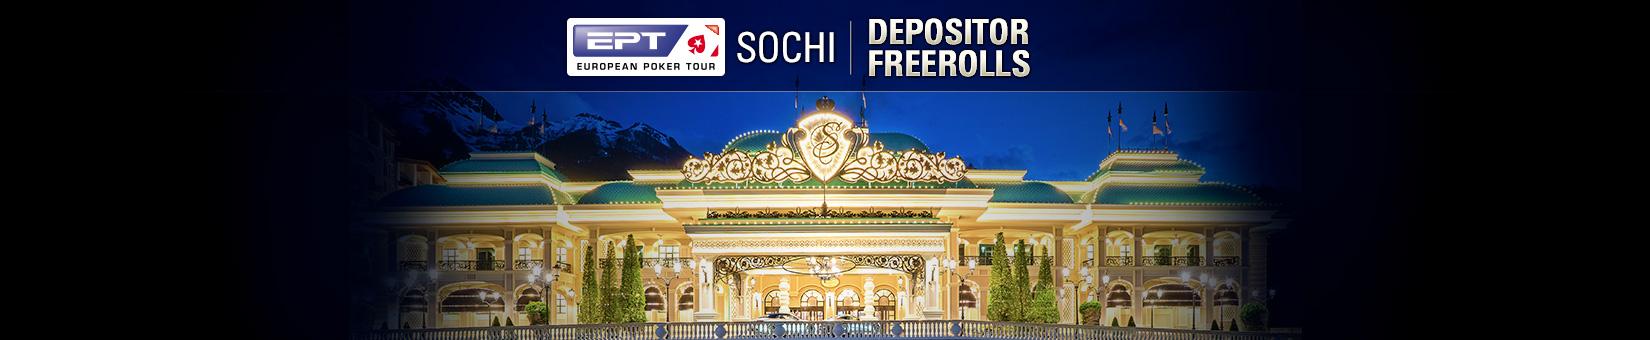 Sochi Depositor Freerolls